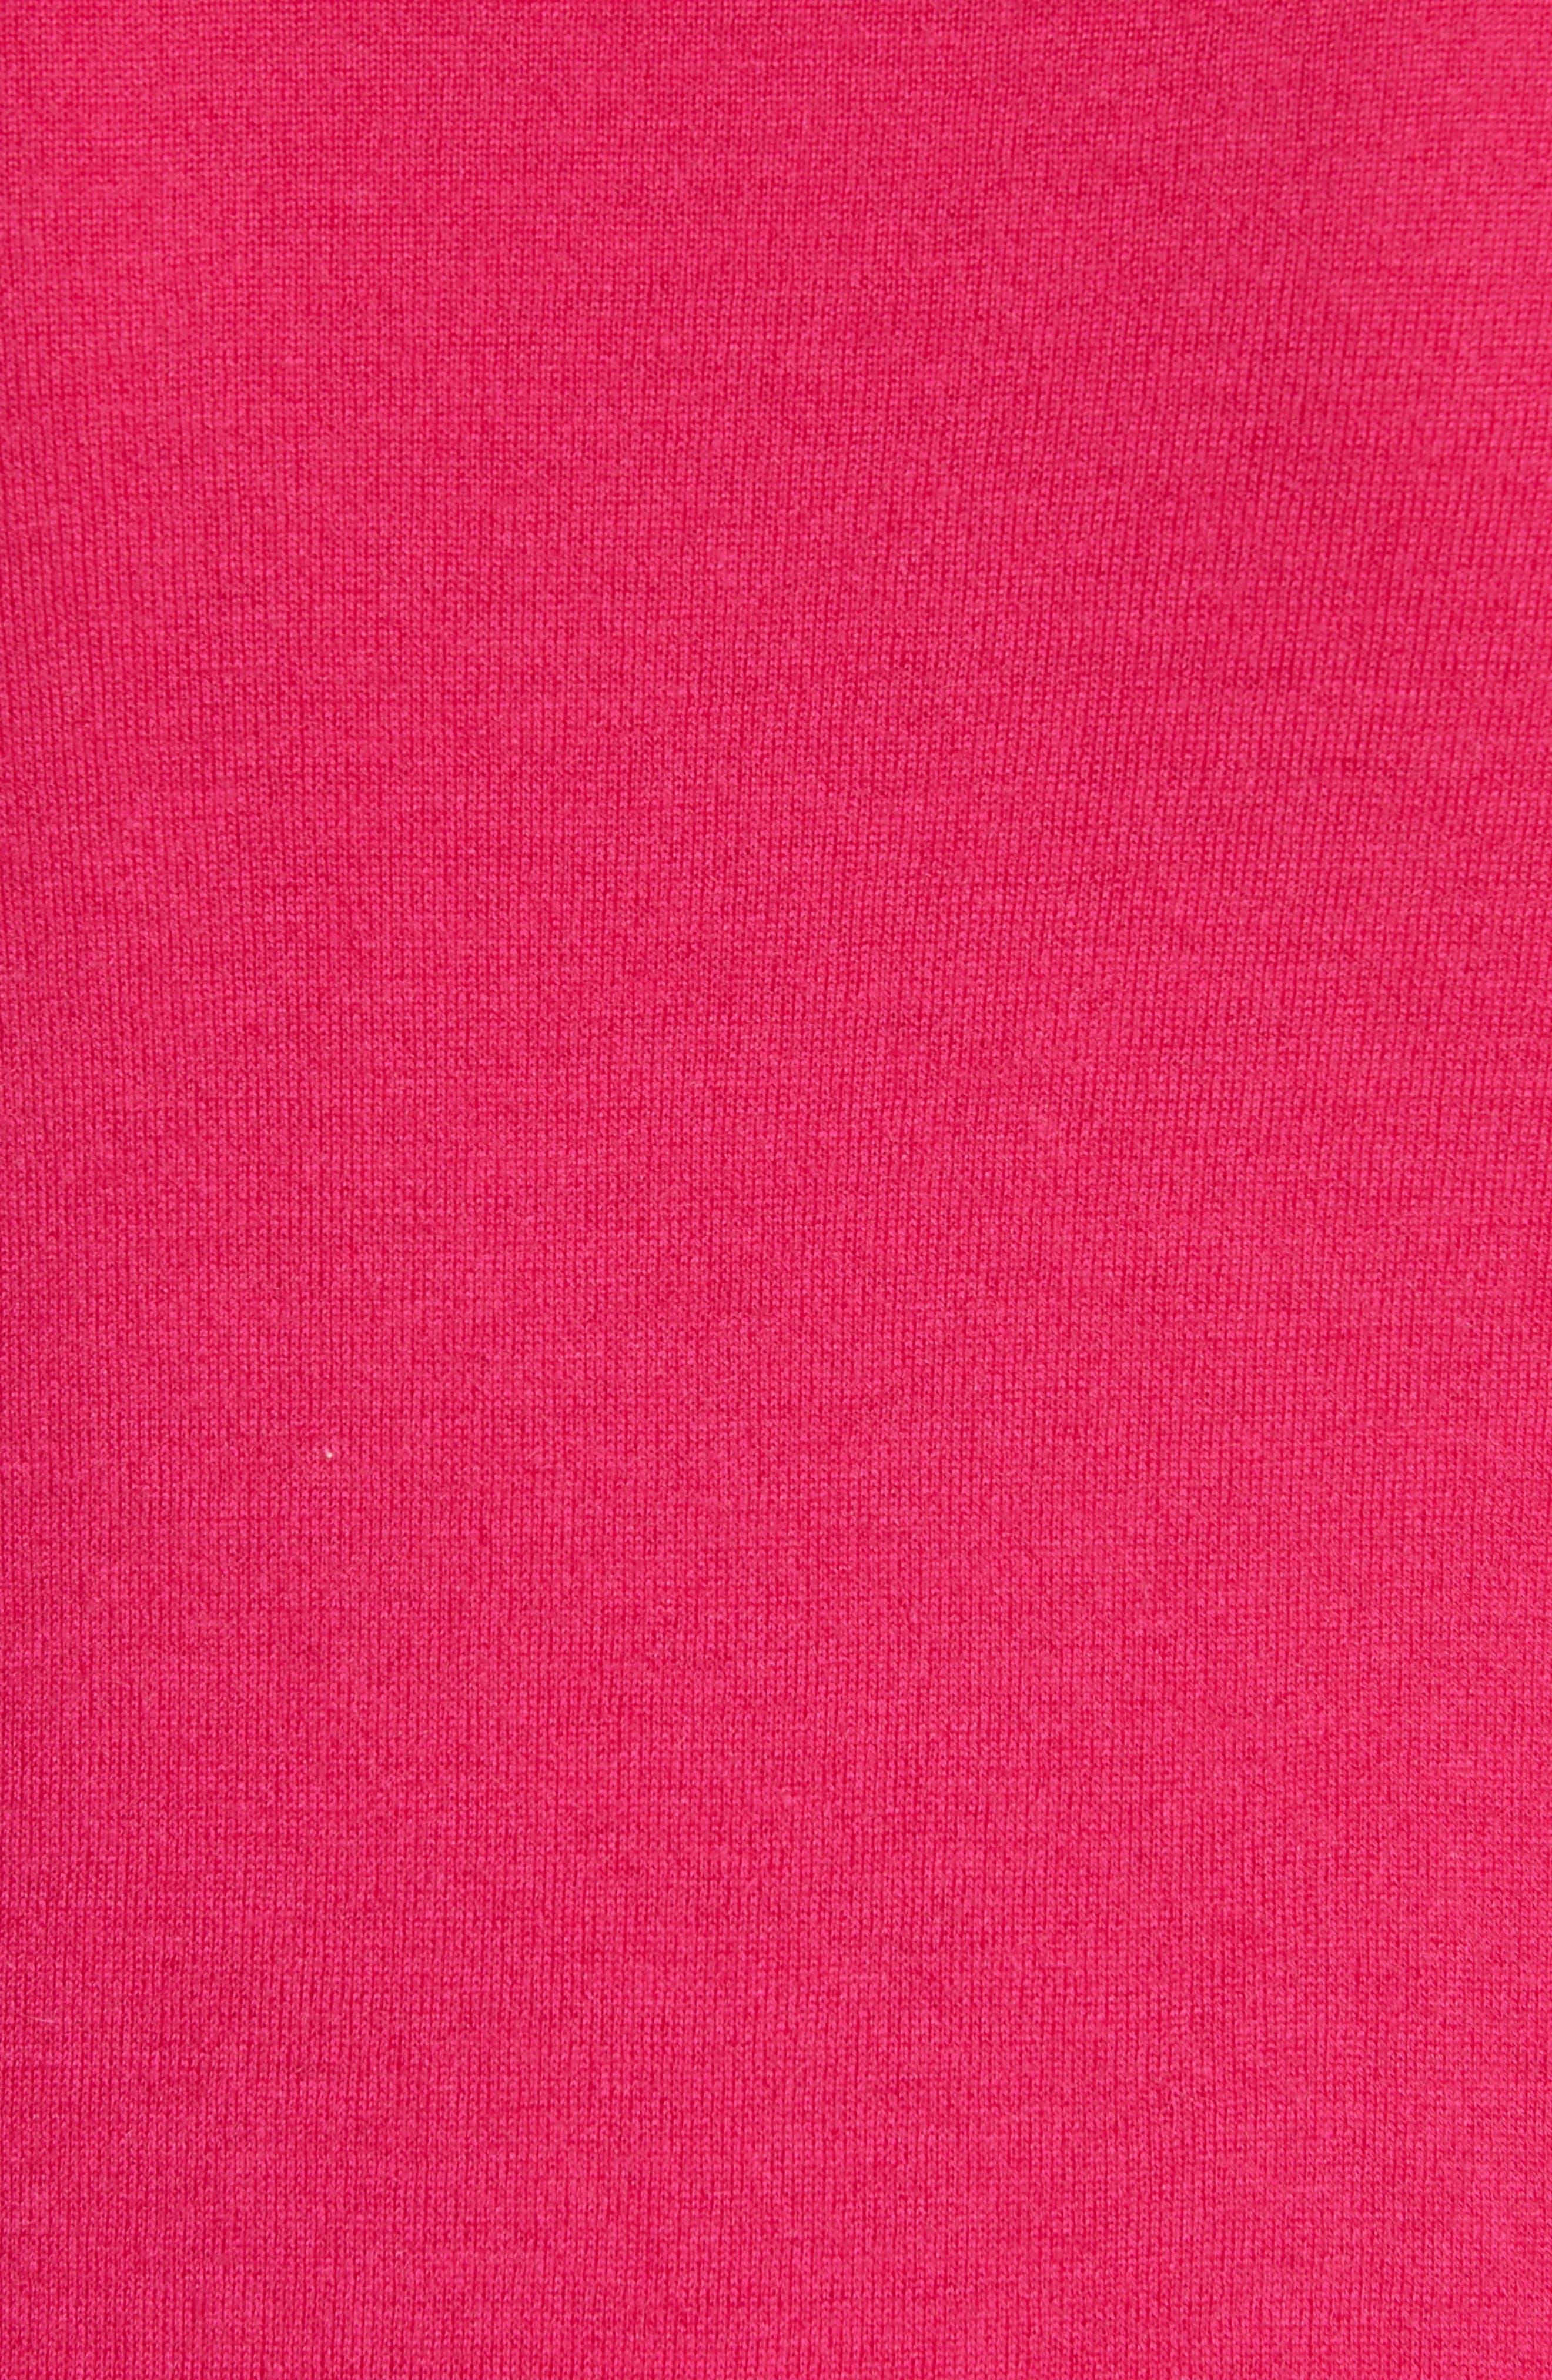 Alternate Image 5  - Michael Kors Featherweight Cashmere Cardigan